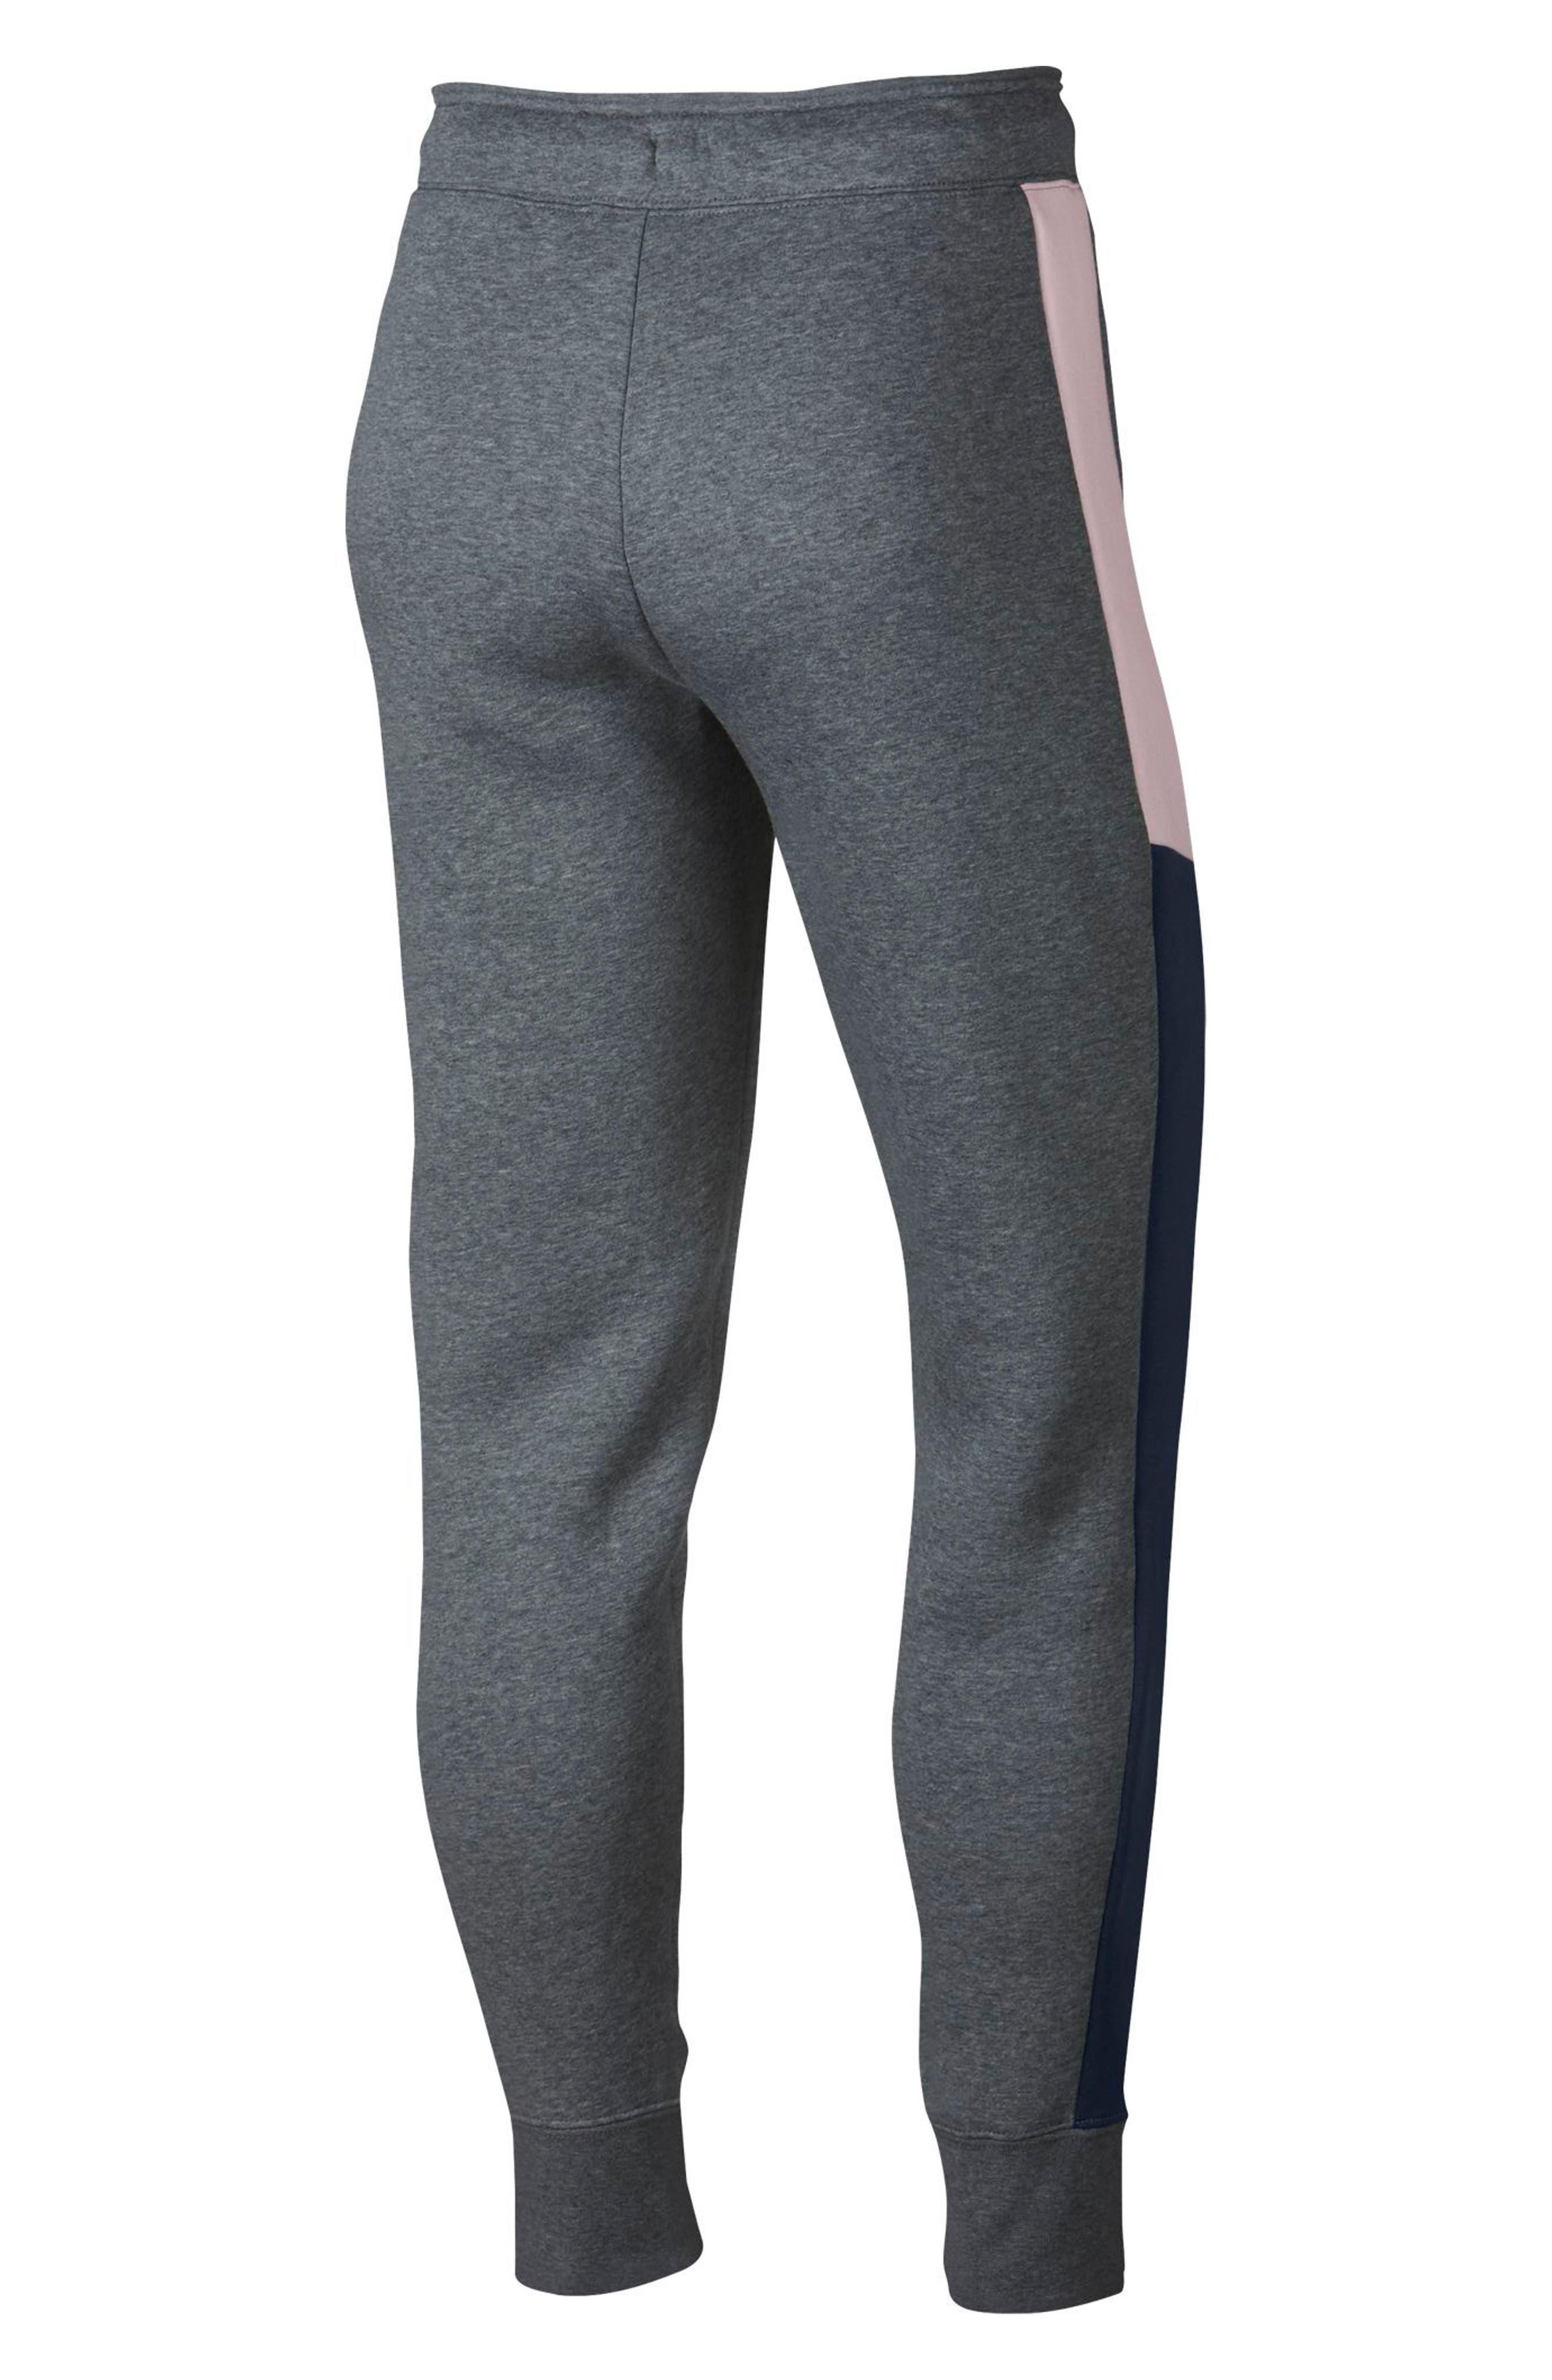 Sportswear Women's Rally Pants,                             Alternate thumbnail 2, color,                             Carbon Htr/ Obsidian/ Pink